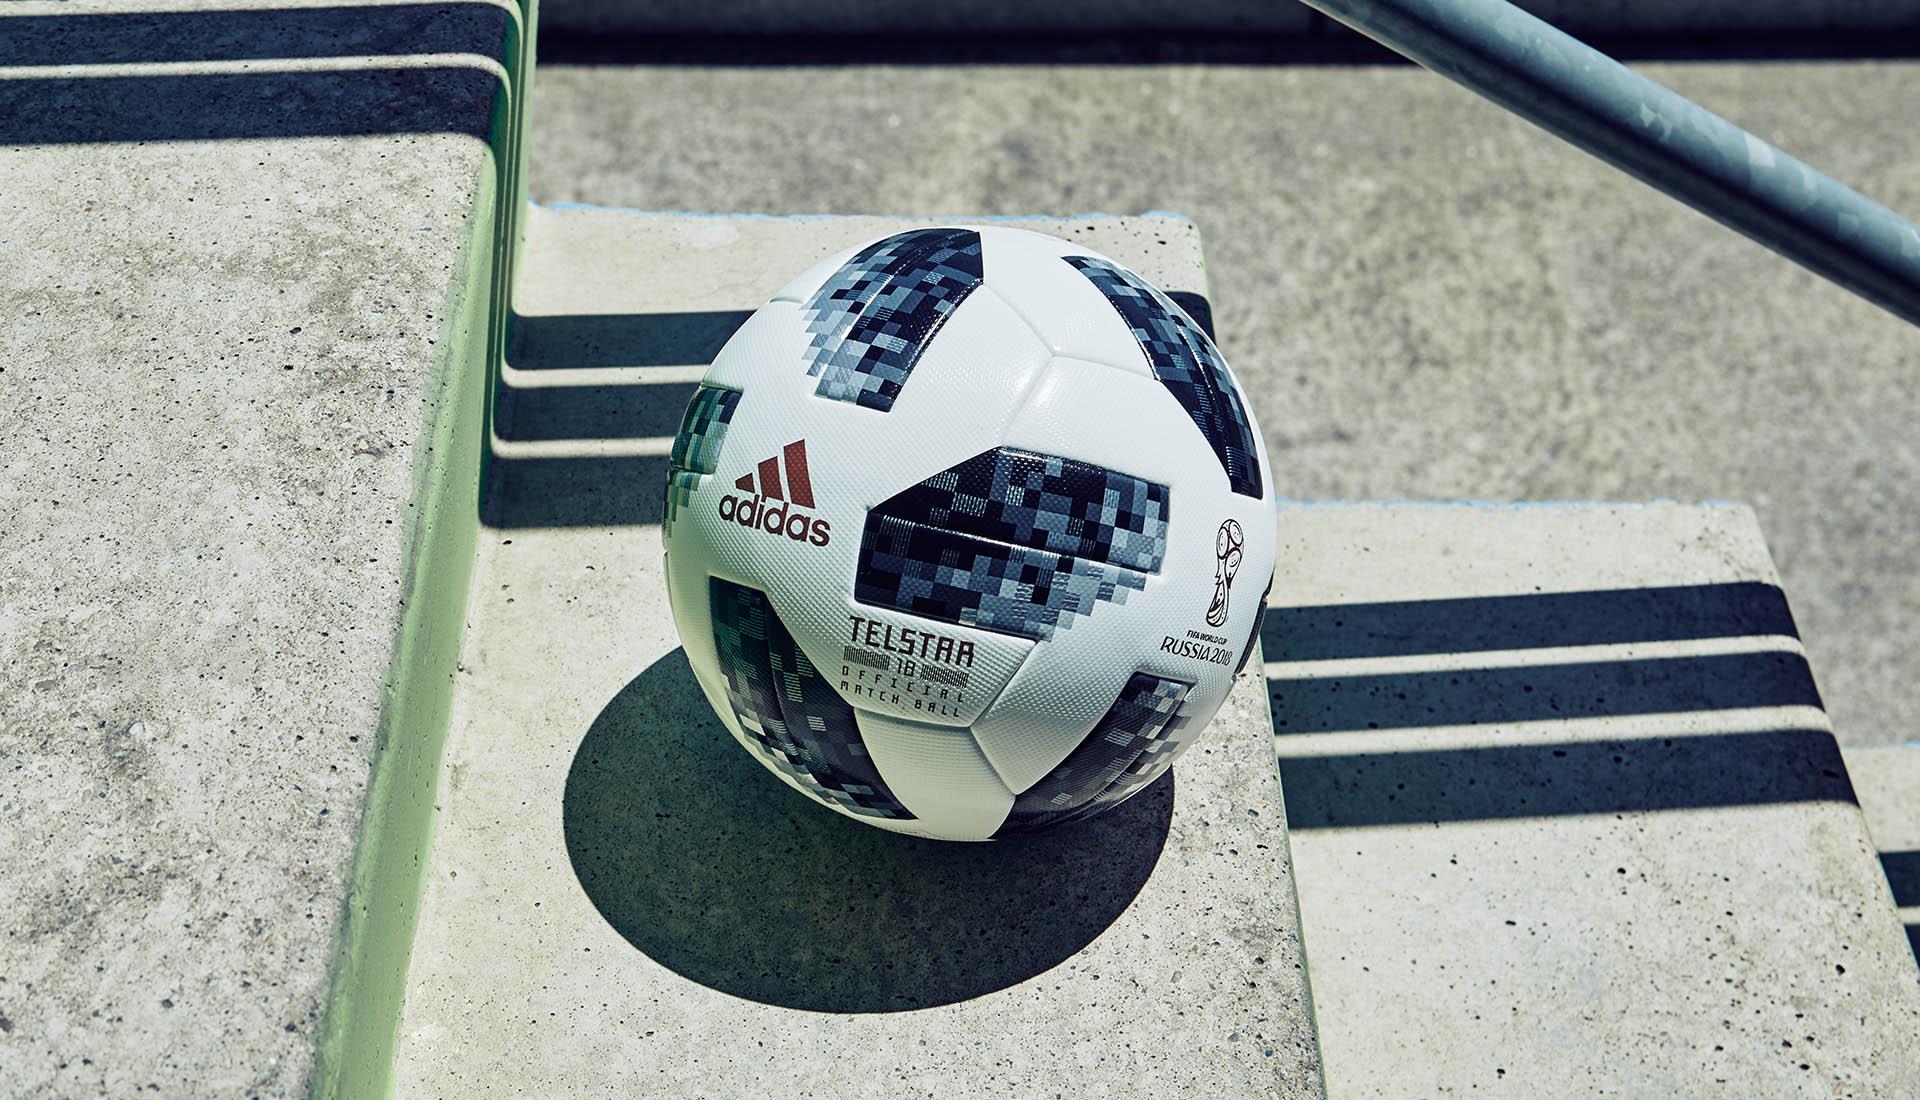 Simple Football Ball World Cup 2018 - world-cup-match-ball-adidas-soccerbible_0003__fg_1991  2018_907360 .jpg